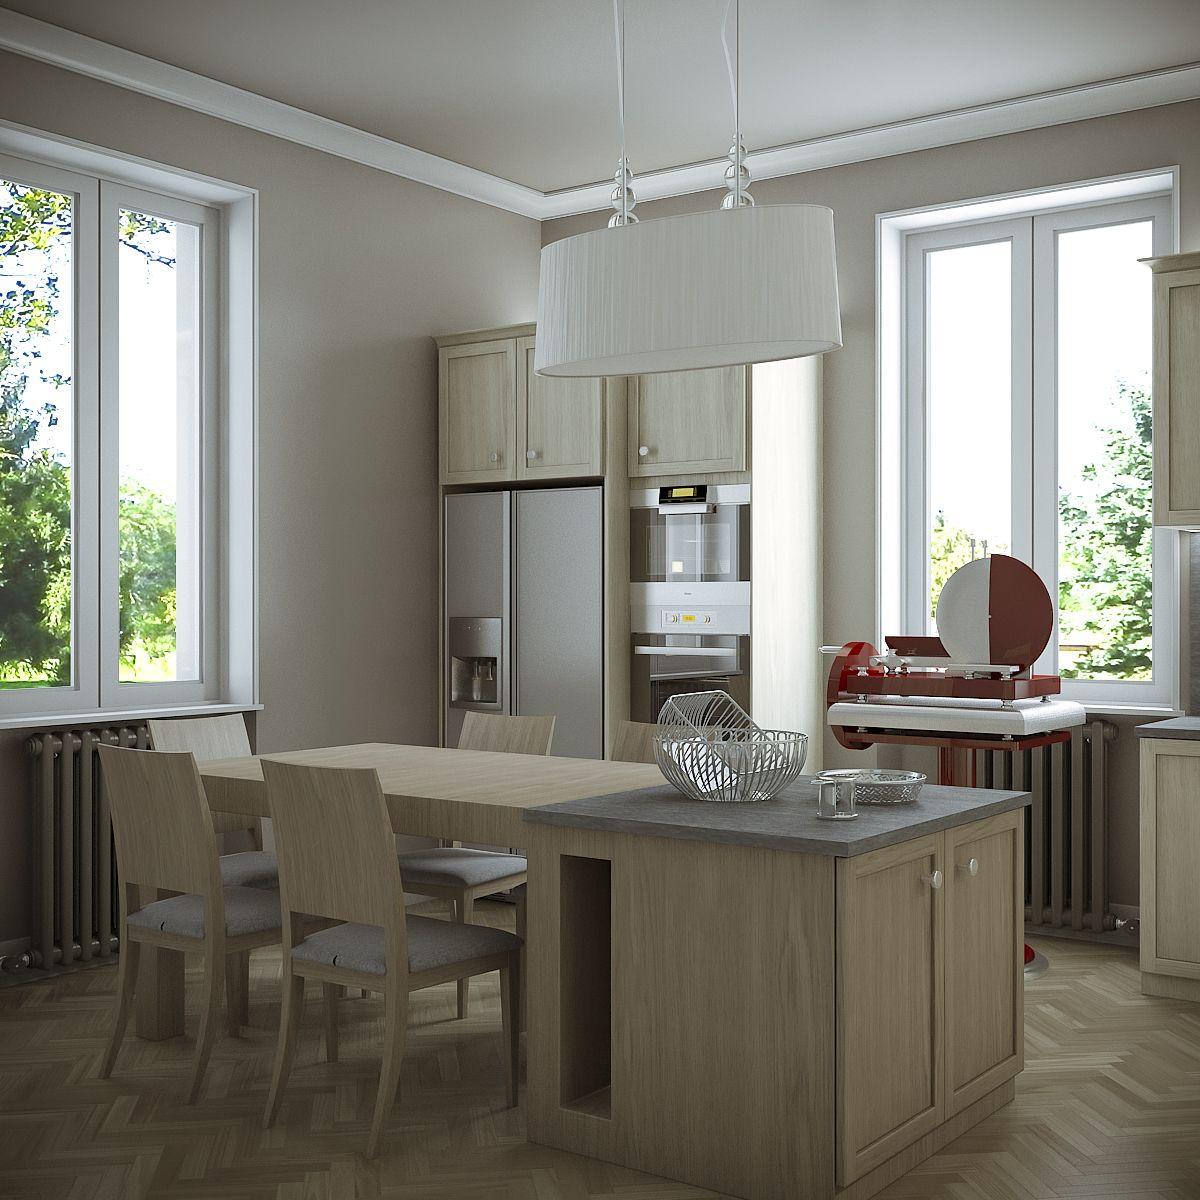 Family Home - Kitchen 78